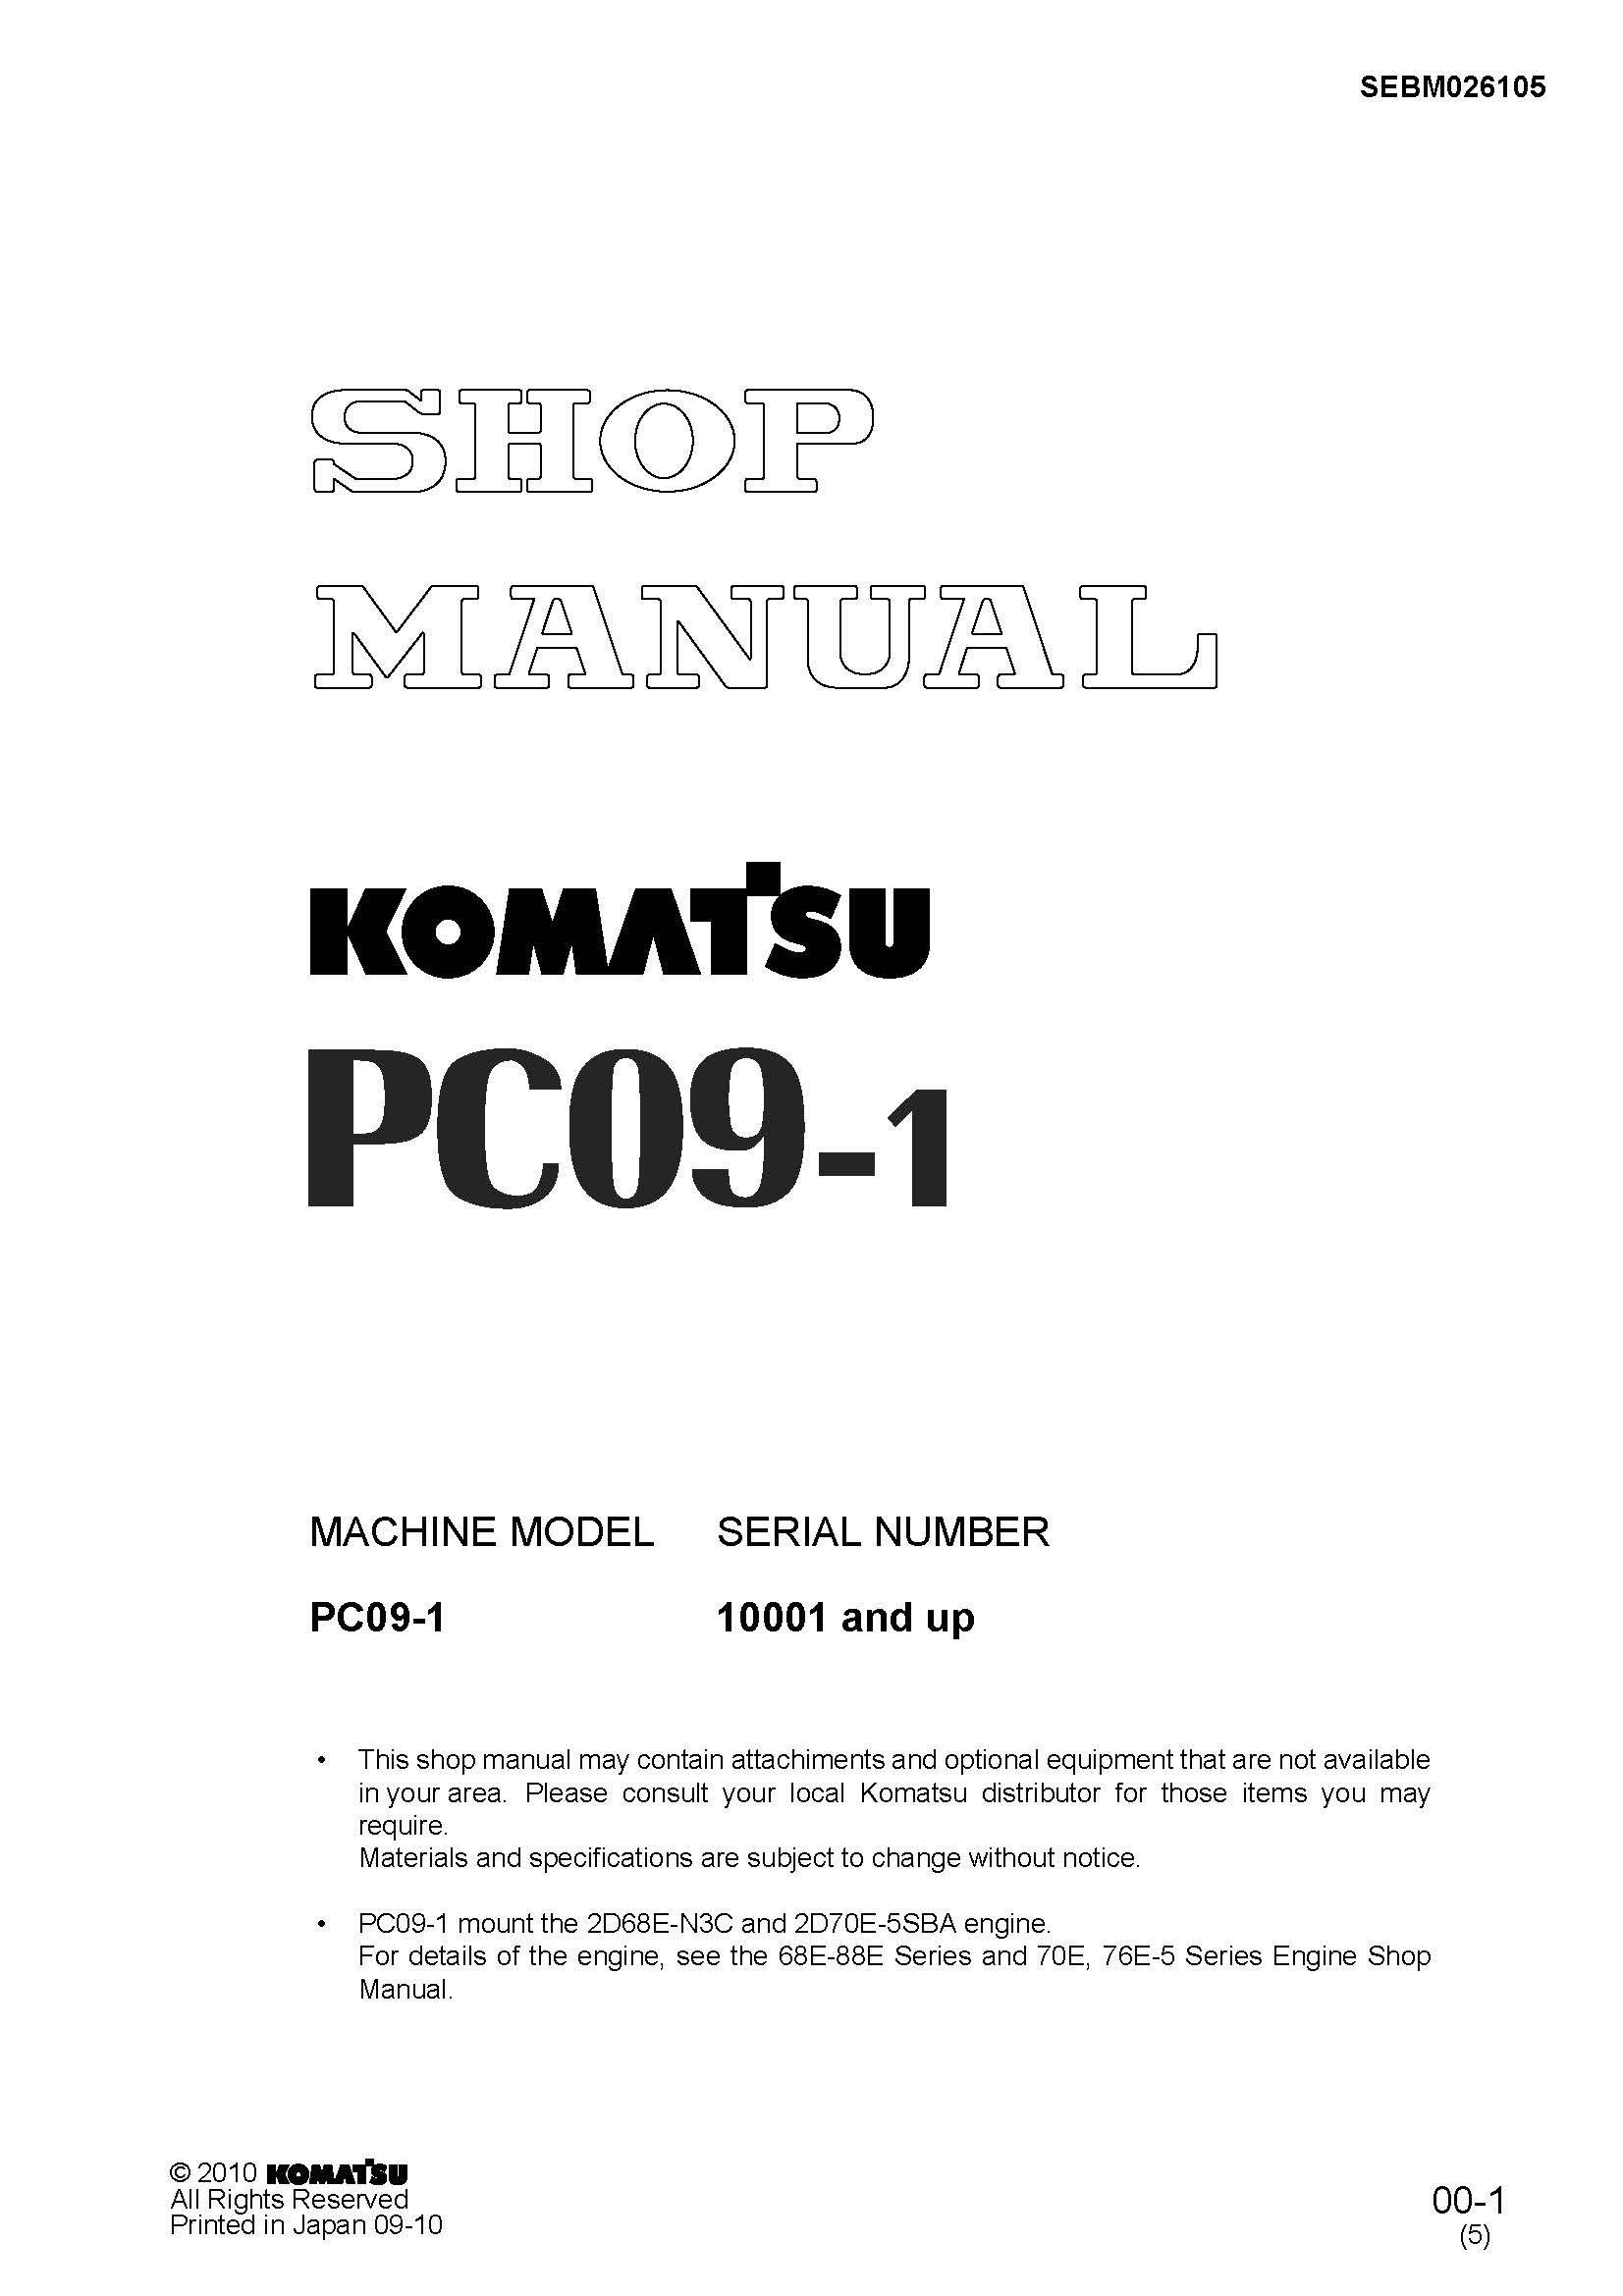 Komatsu Pc09 1 Hydraulic Excavator Workshop Repair Service Manual Pdf Download Service Manual Repair Manual Pdf Download Hydraulic Excavator Komatsu Excavator